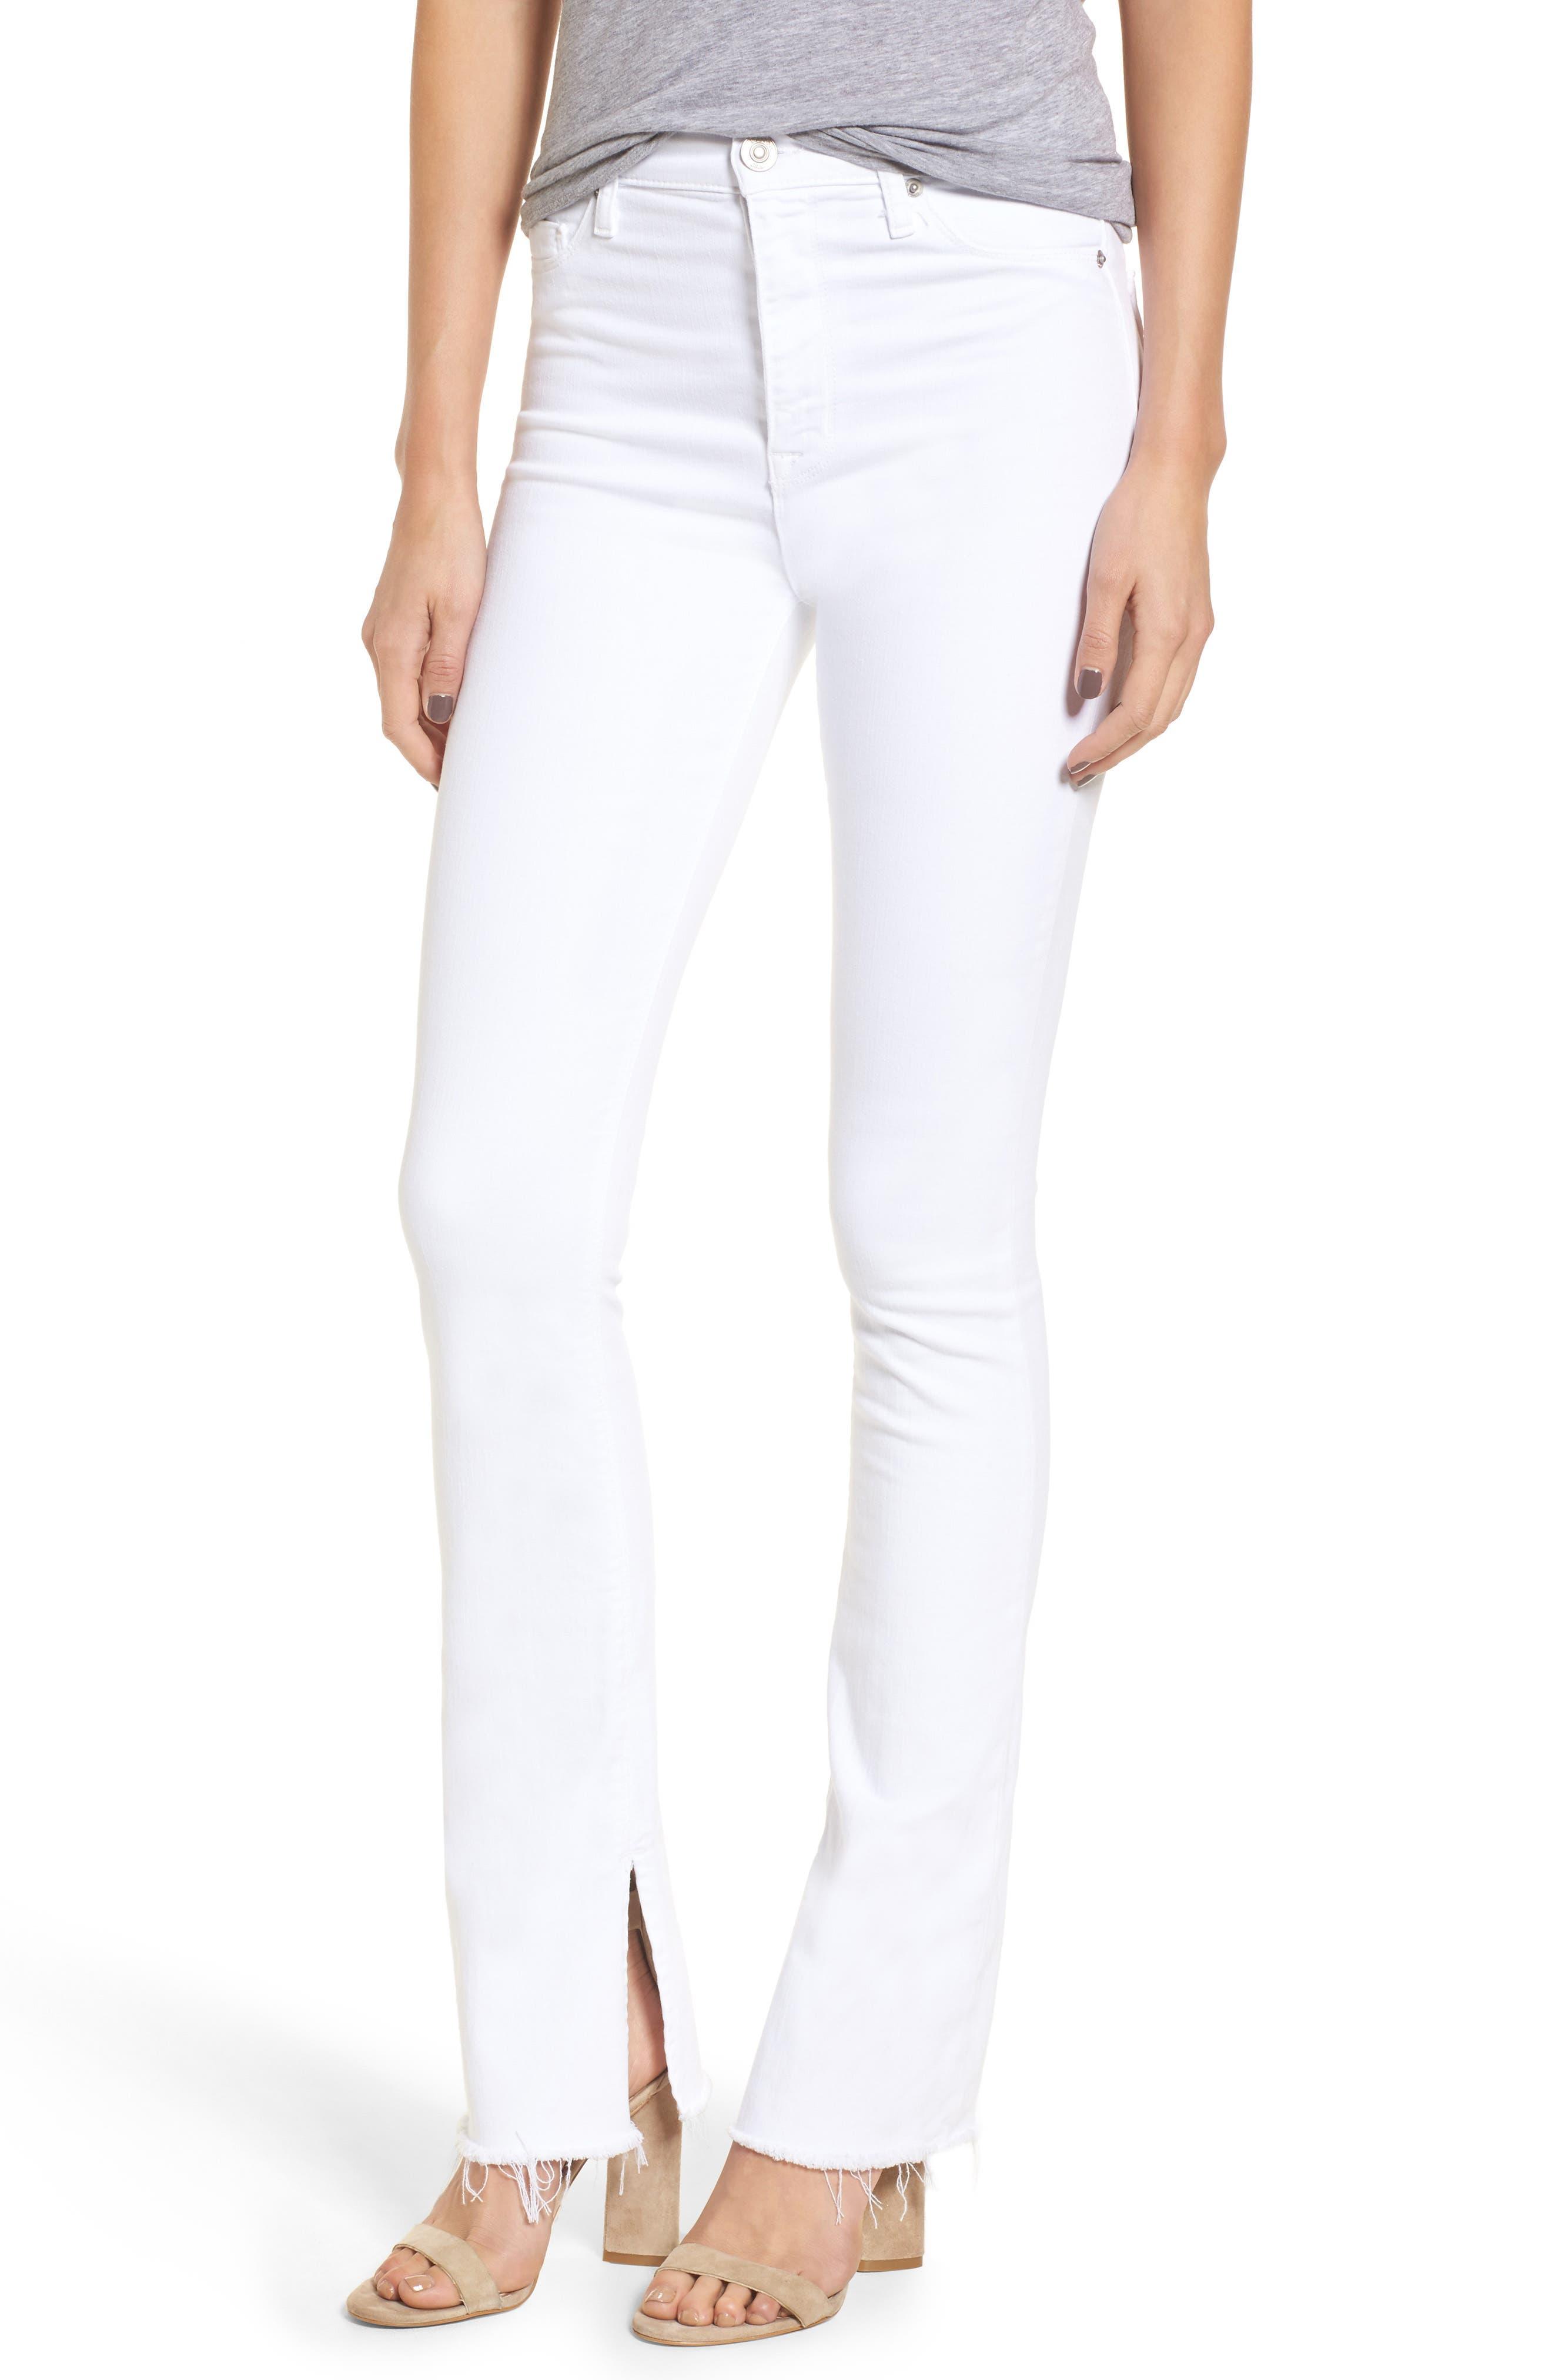 Alternate Image 1 Selected - Hudson Jeans Heartbreaker High Waist Bootcut Jeans (Optical White)